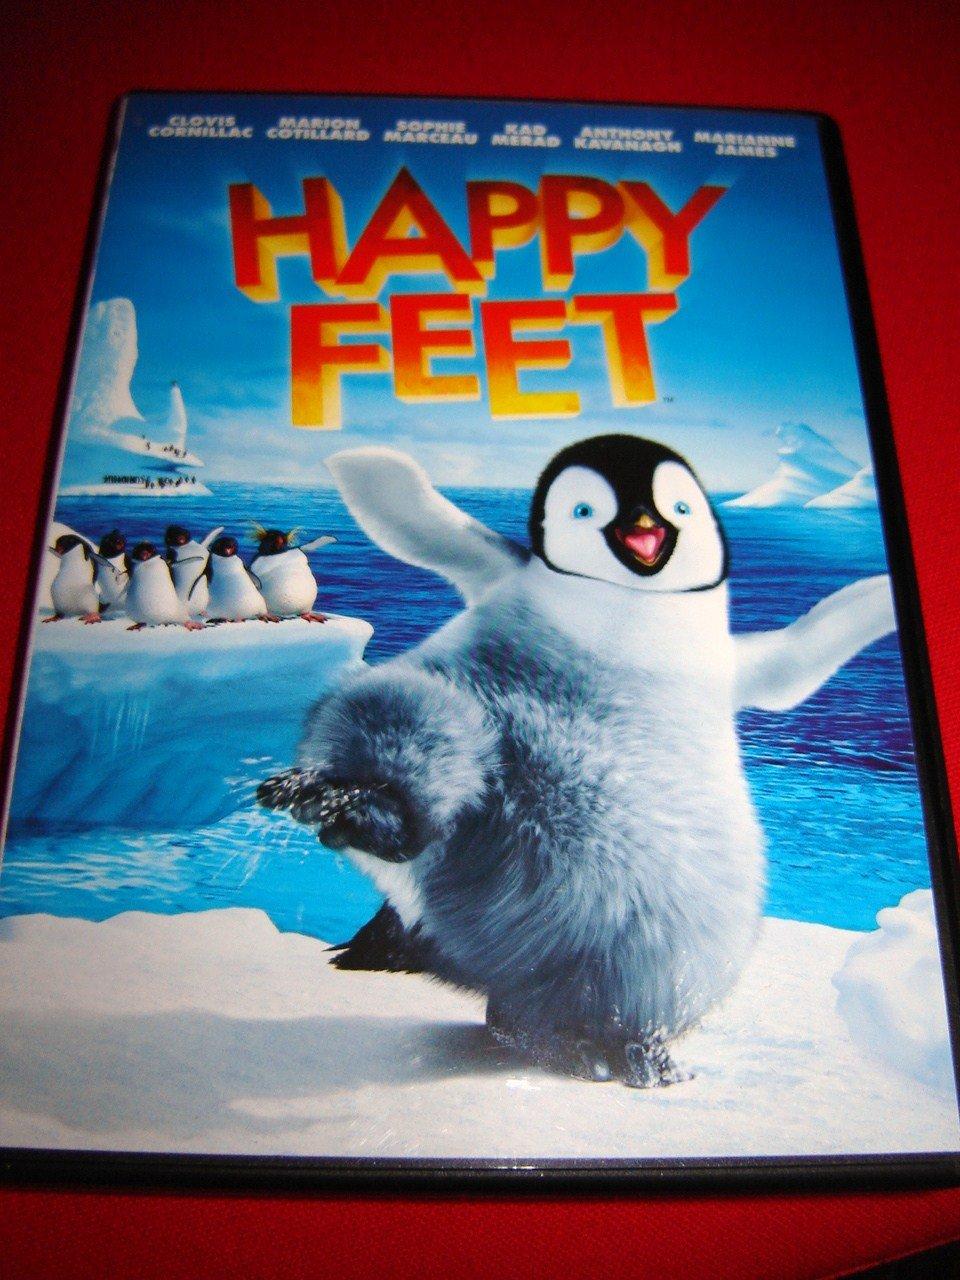 Amazon Com Happy Feet 2006 Jackman Hugh Kidman Nicole Murphy Brittany Szubanski Magda Weaving Hugo George Miller Movies Tv